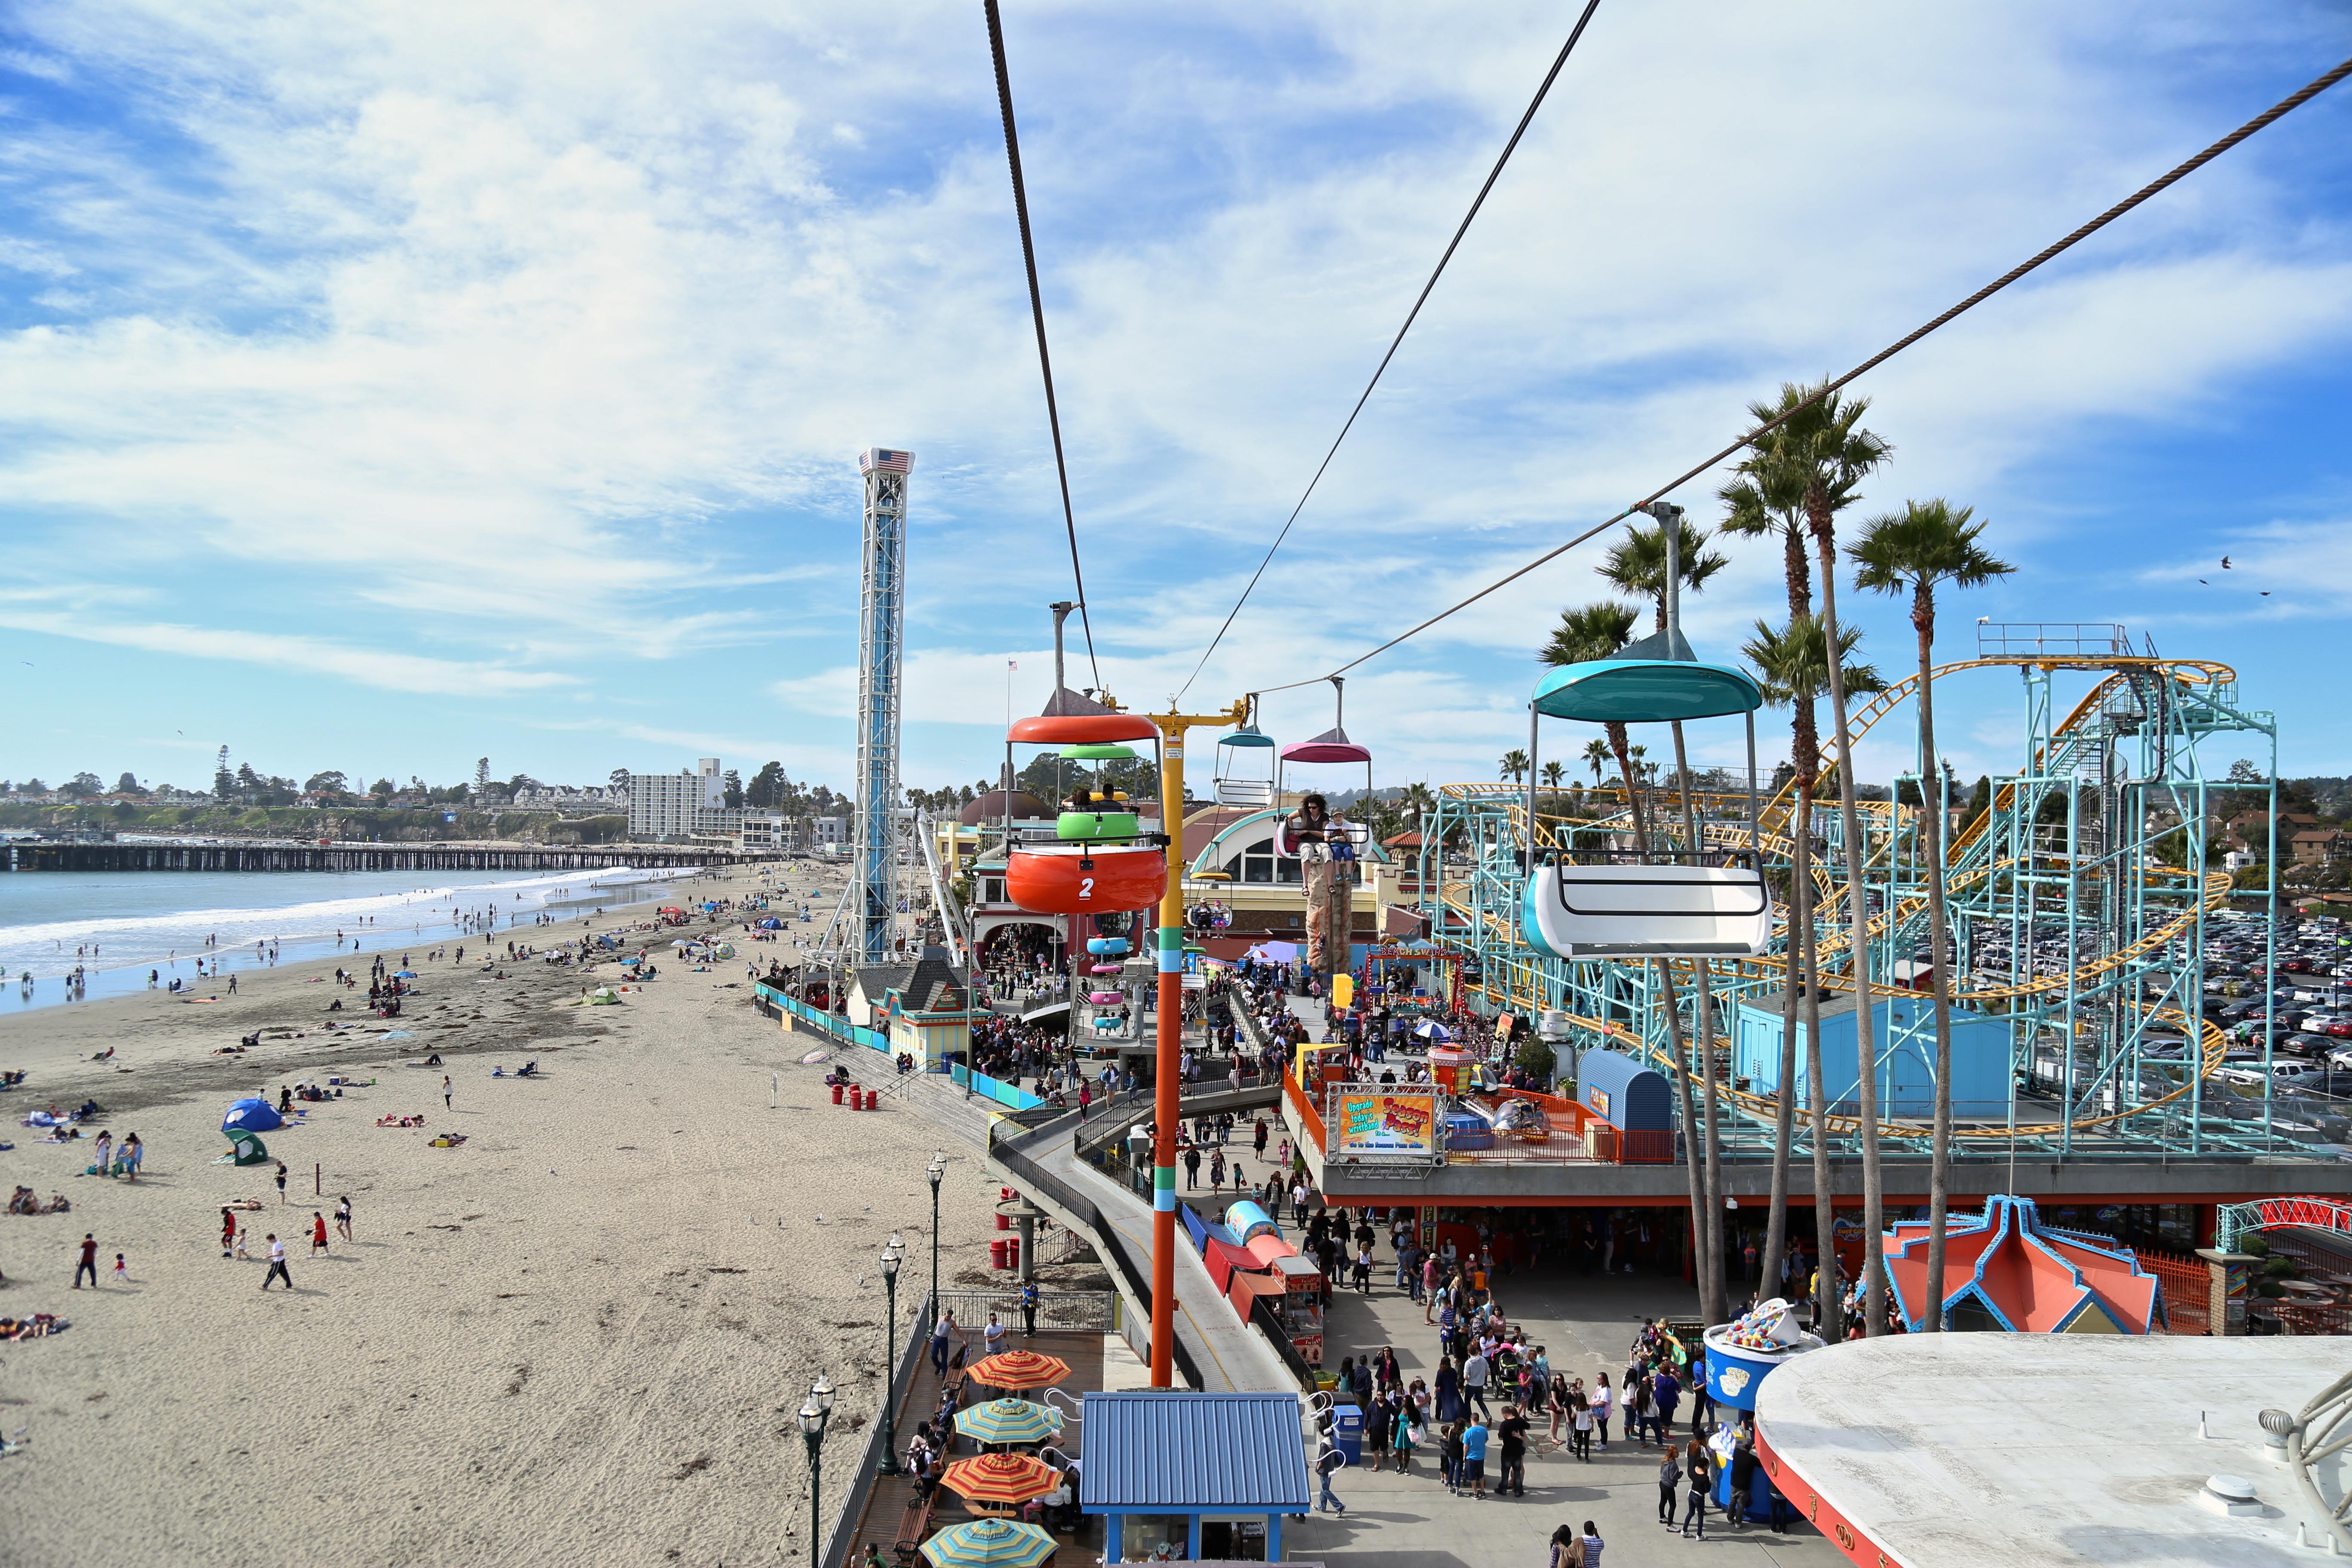 Santa Cruz : La ville du Surf